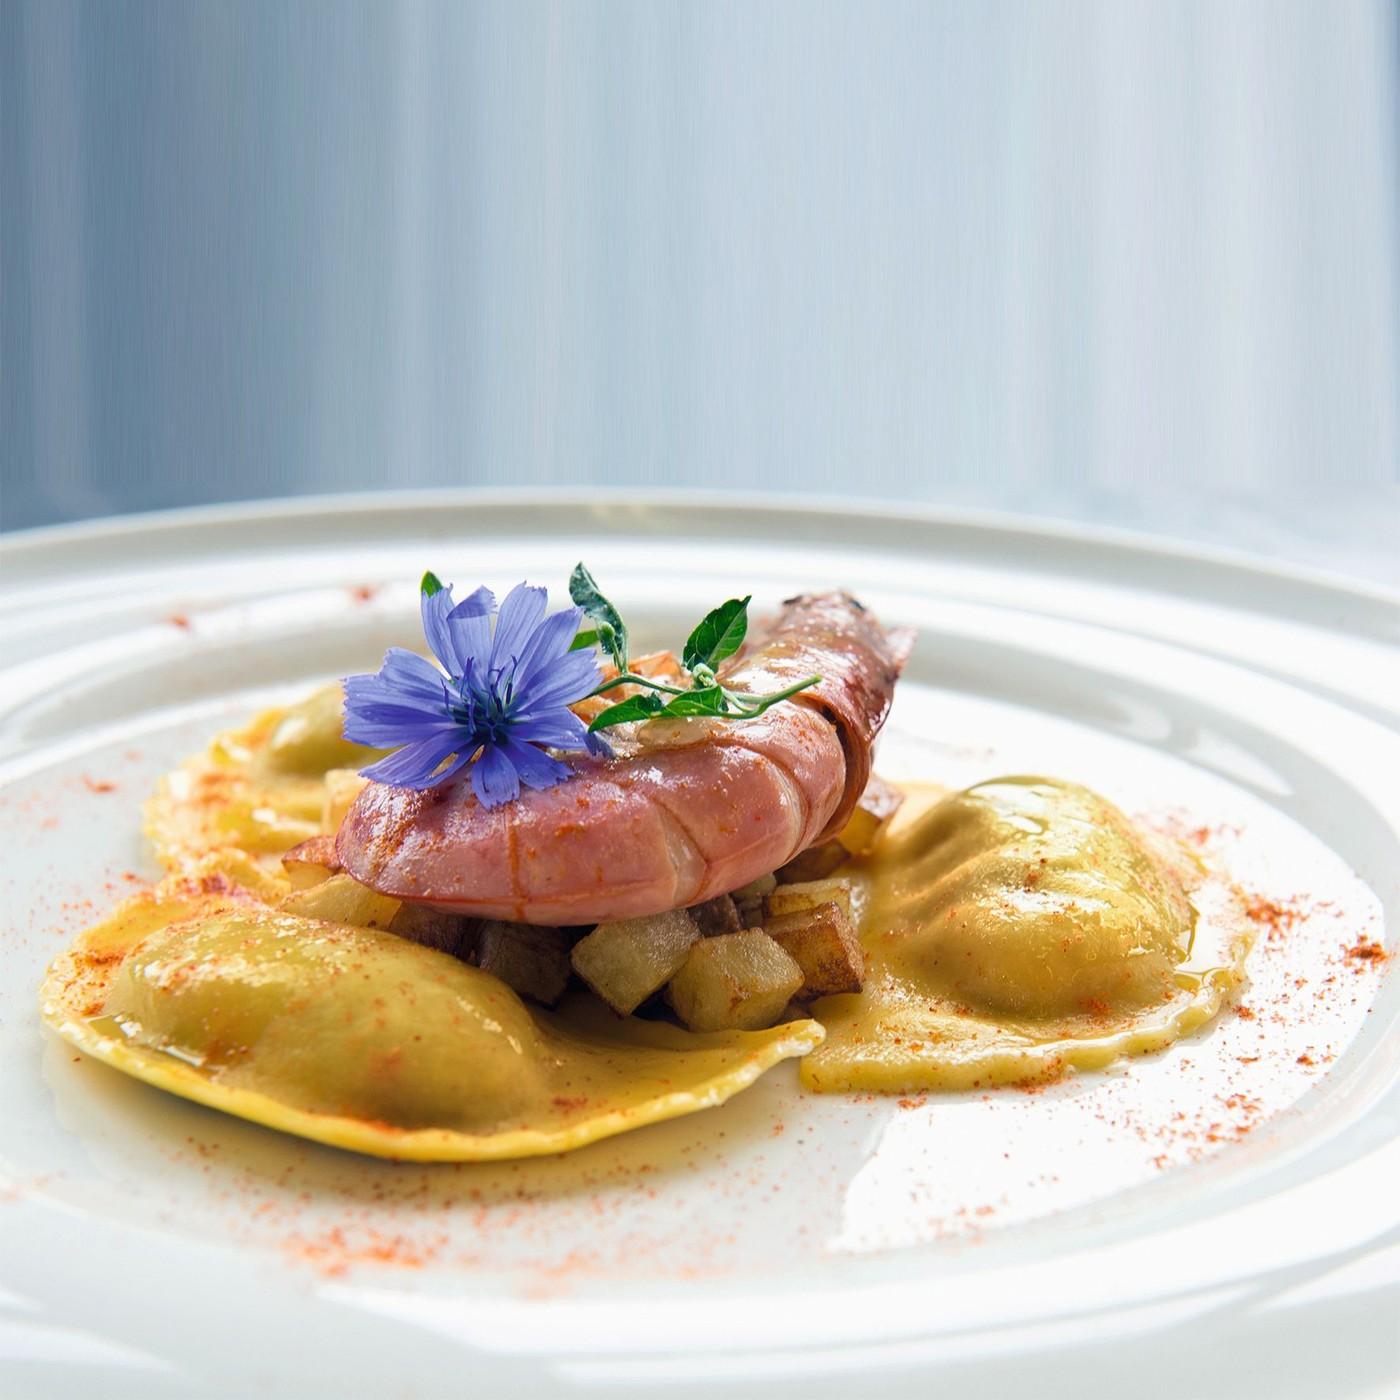 receta de Panzerotti de ricotta y boletus edulis